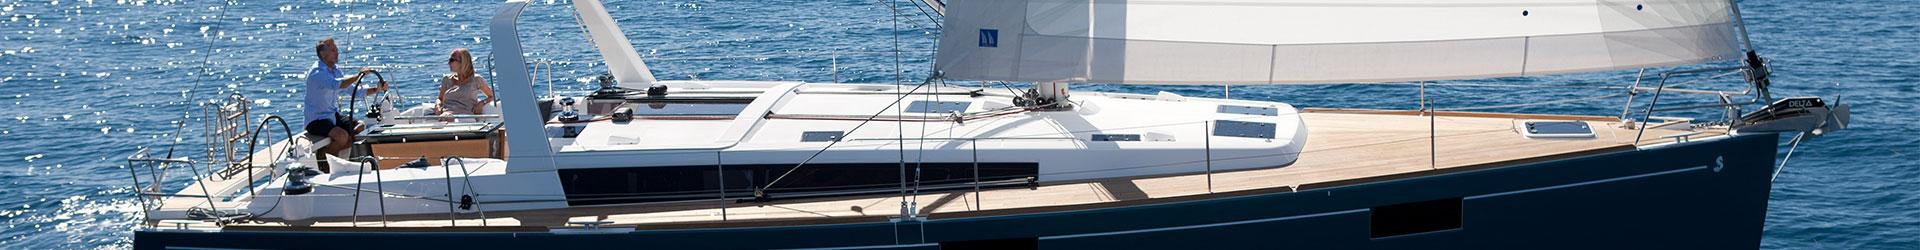 charter placement of new beneteau sailing yachts harbor sailboats rh harborsailboats com 41 Beneteau Sailboats 41 Beneteau Sailboats